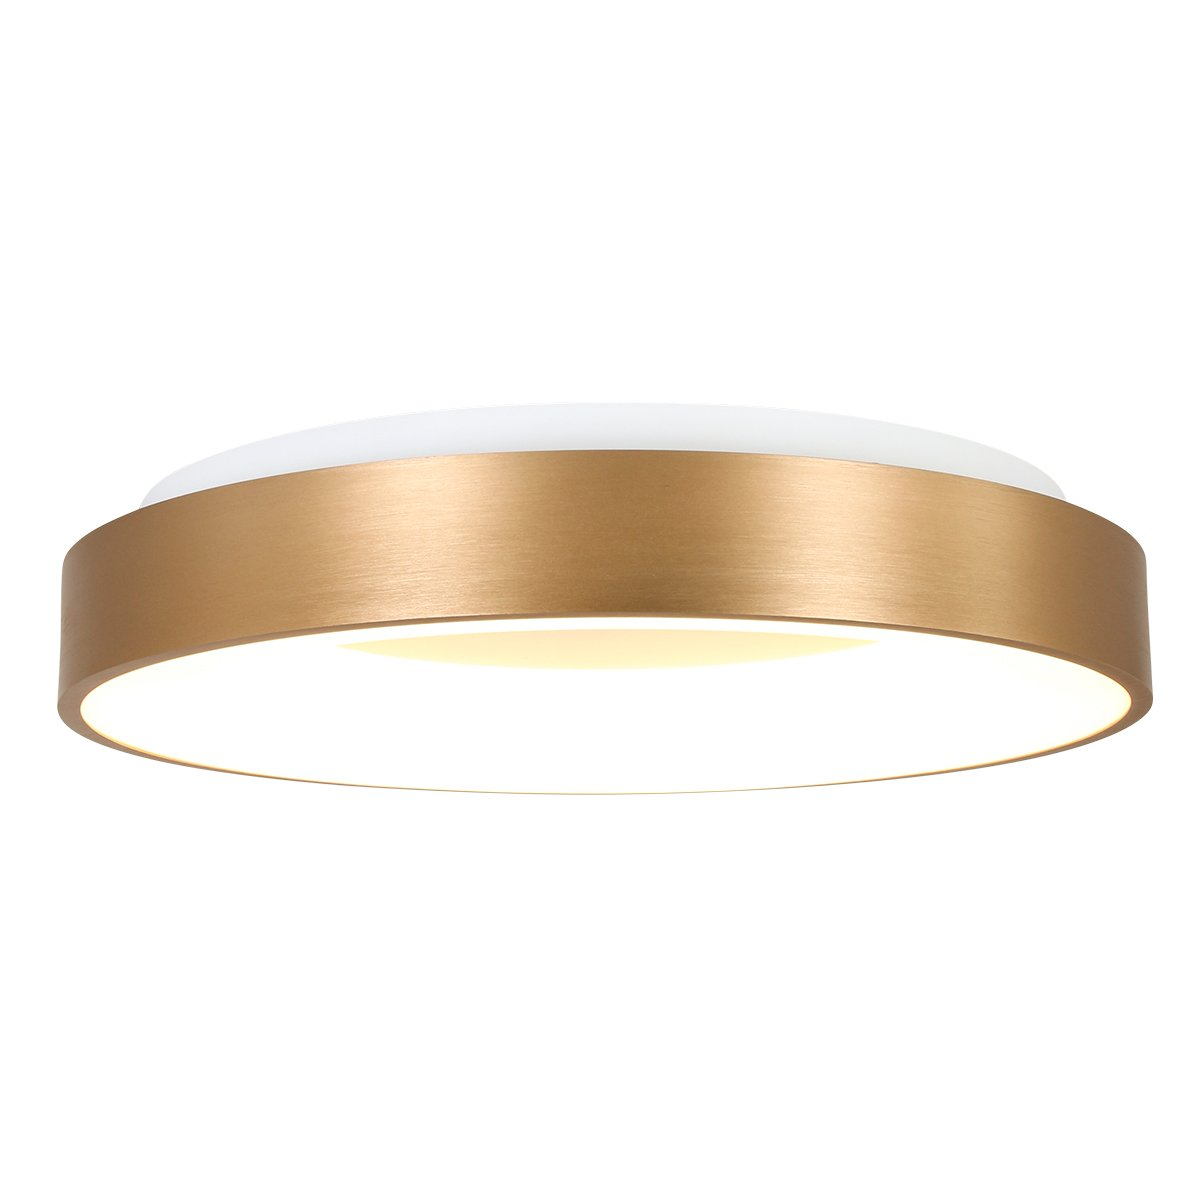 Plafondlamp Steinhauer 2563 Goud